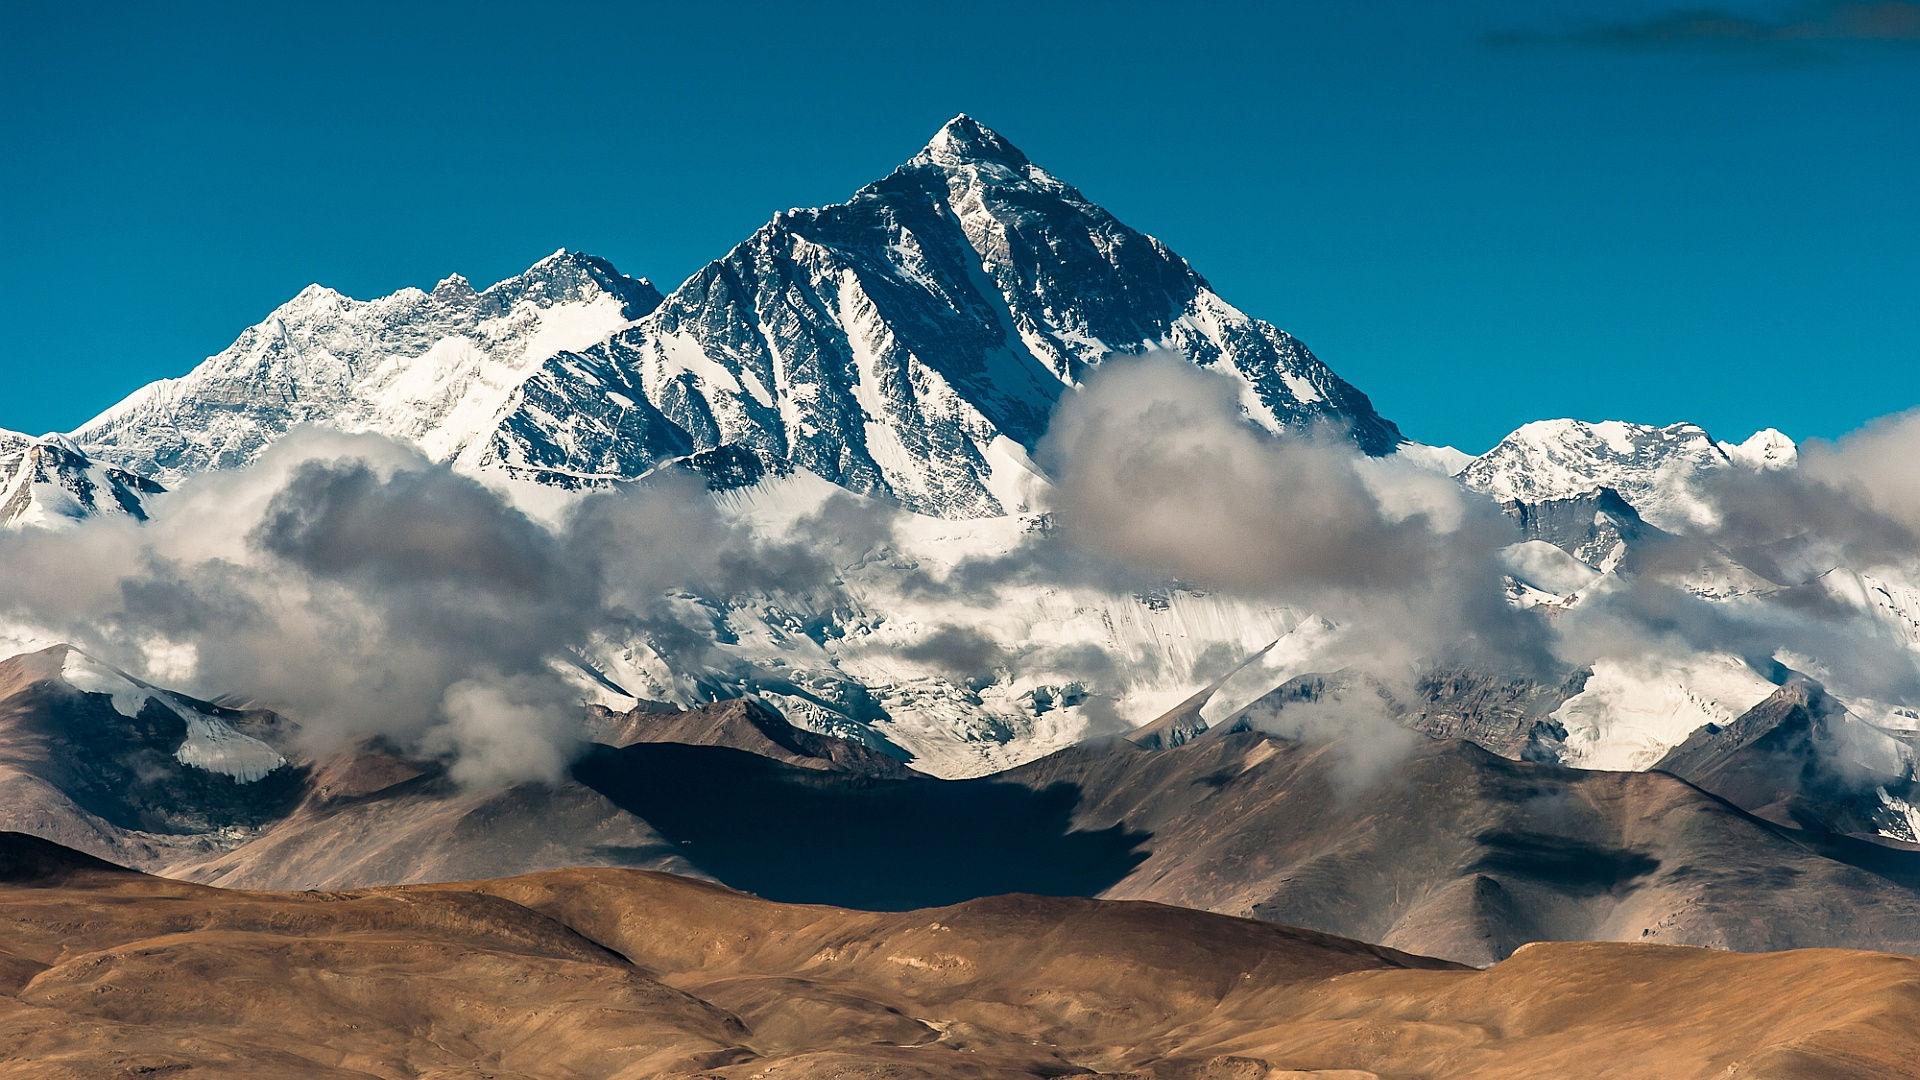 Mount Everest China Snowy Peak Landscape Takayama Clouds 1920x1080